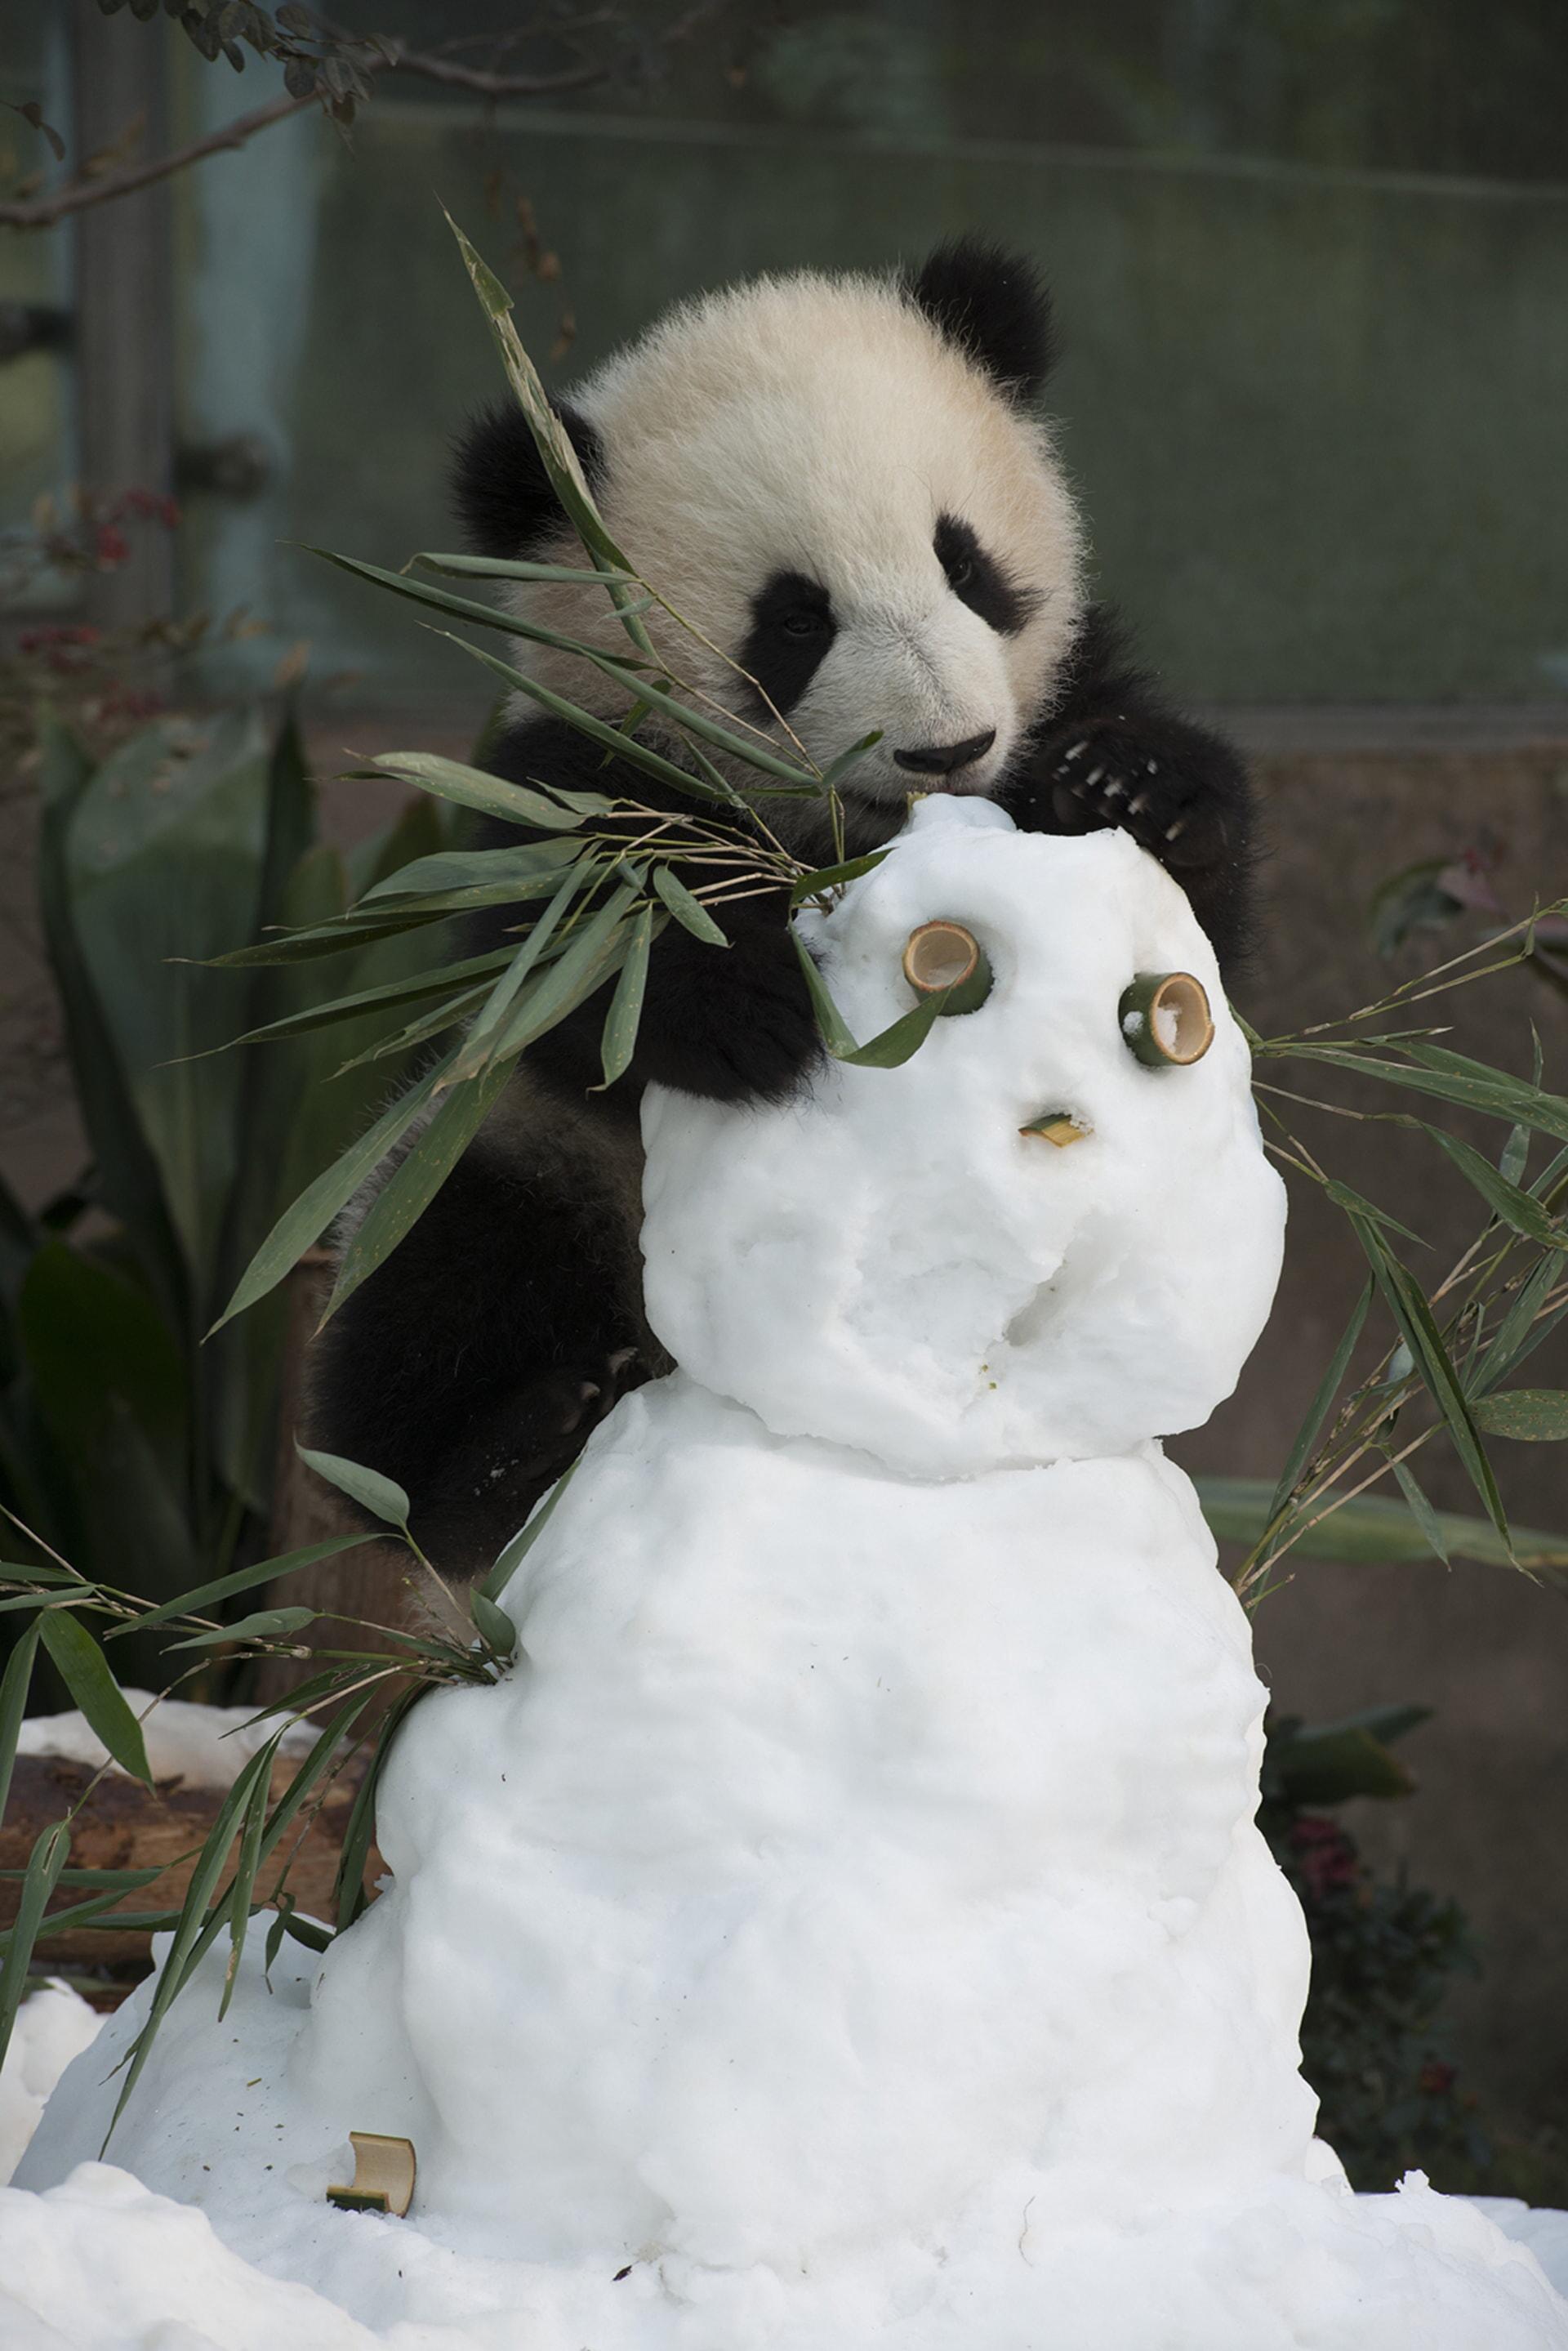 A Giant Panda at China's Chengdu Panda Base as seen in the new IMAX® film, PANDAS